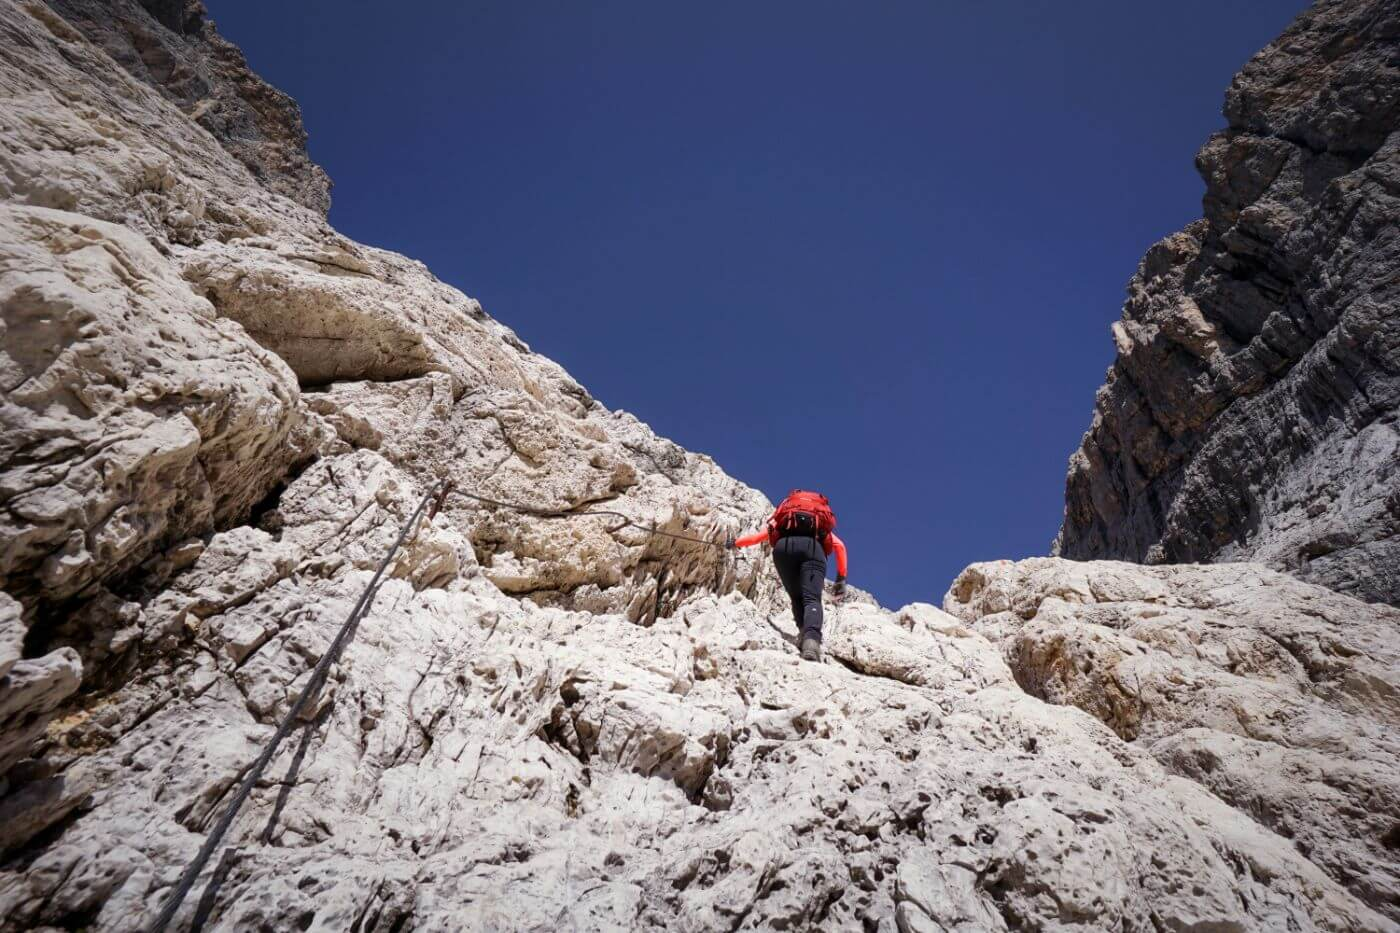 Hiking to Cima della Vezzana, Dolomites Day Hikes